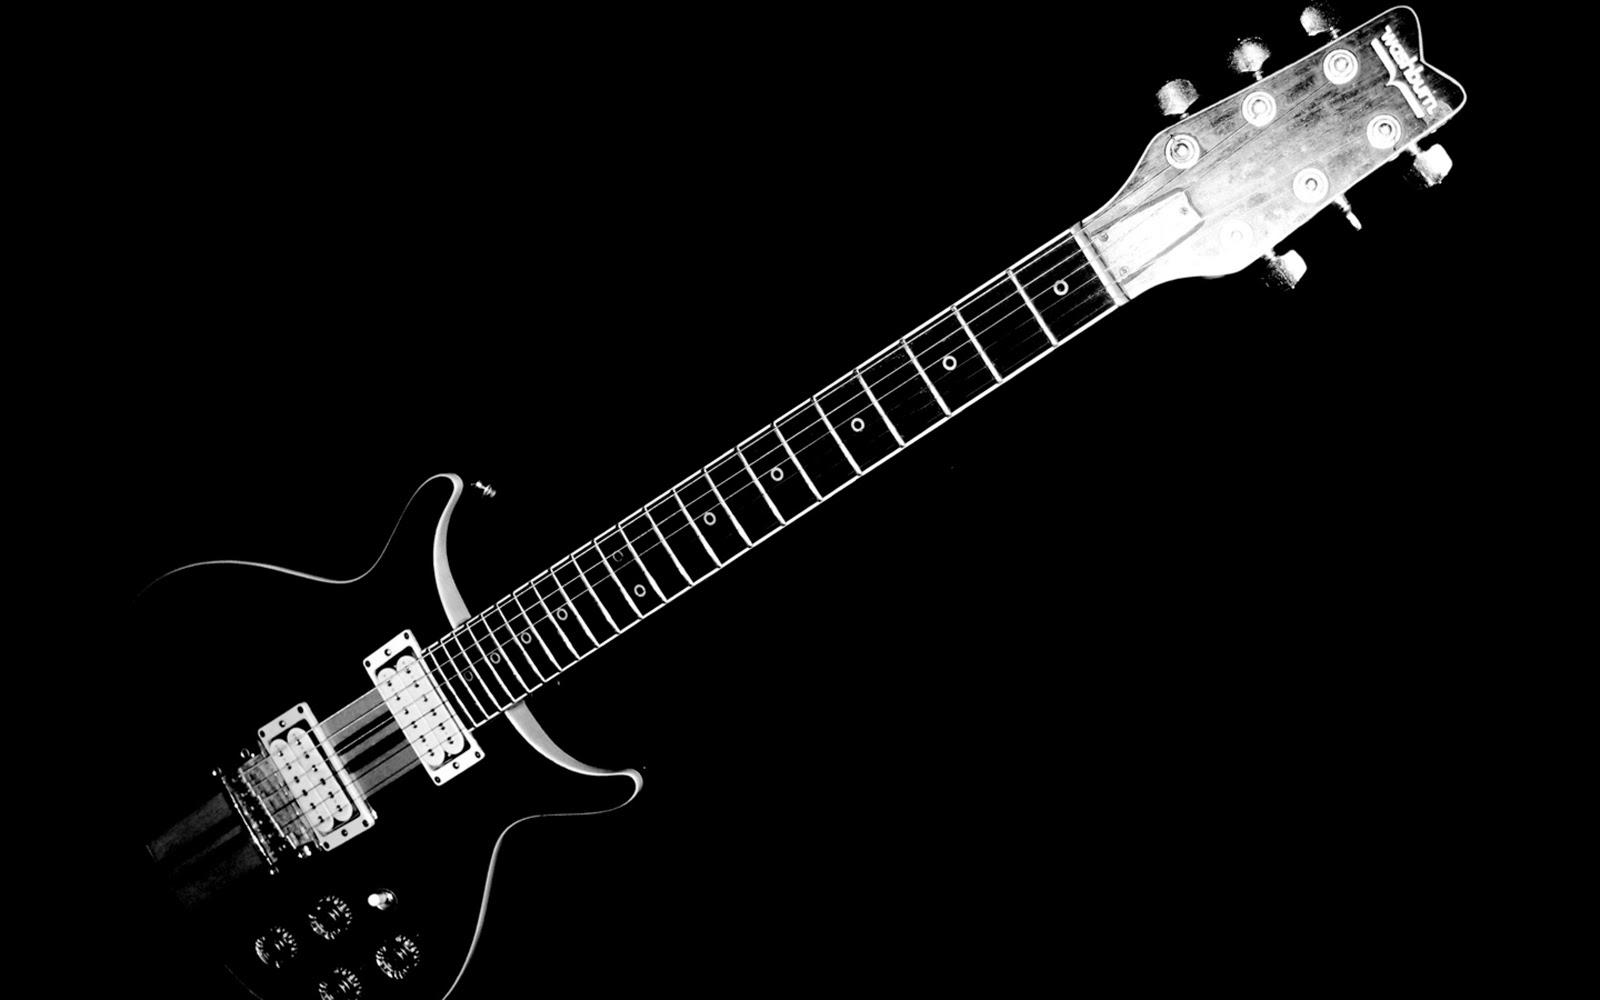 Guitar Chords Hd Pic